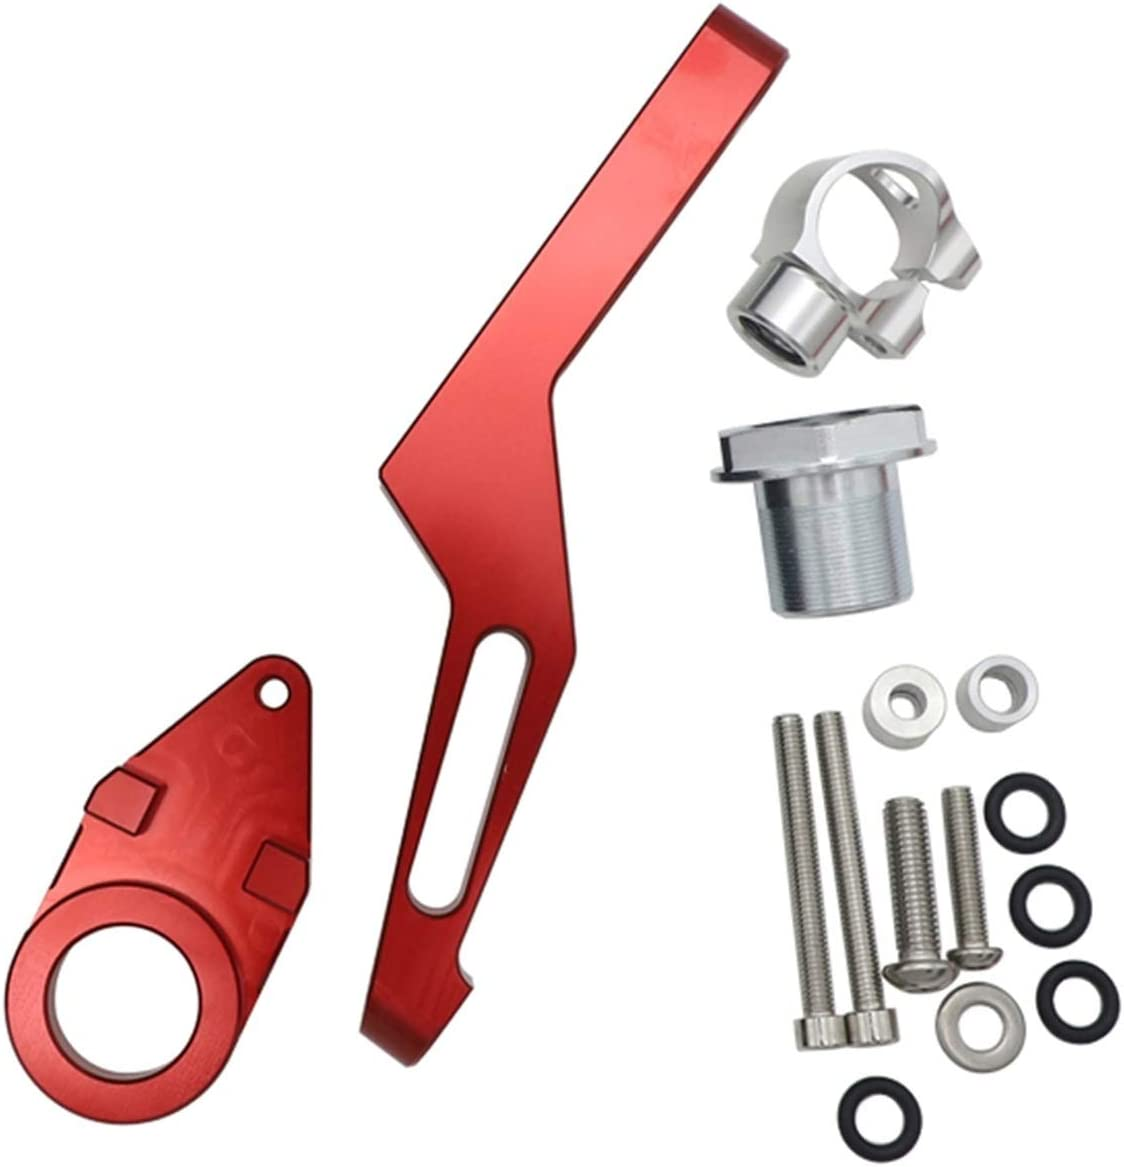 YGGFA Max 76% Popular brand OFF Motorcycle Steering Damper for Stabilizer Kawasa Bracket